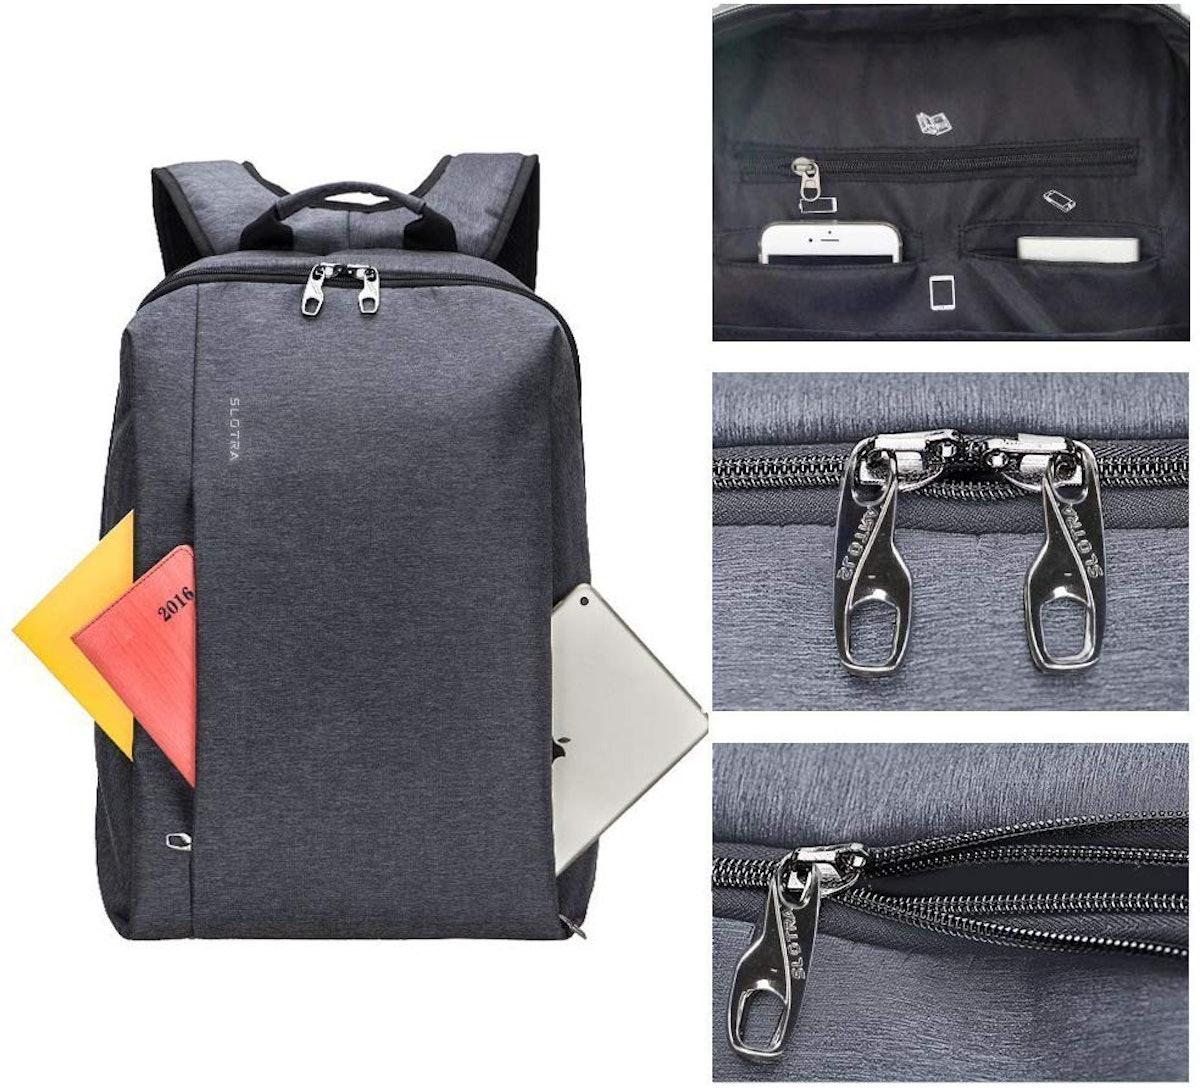 Slotra Laptop Backpack